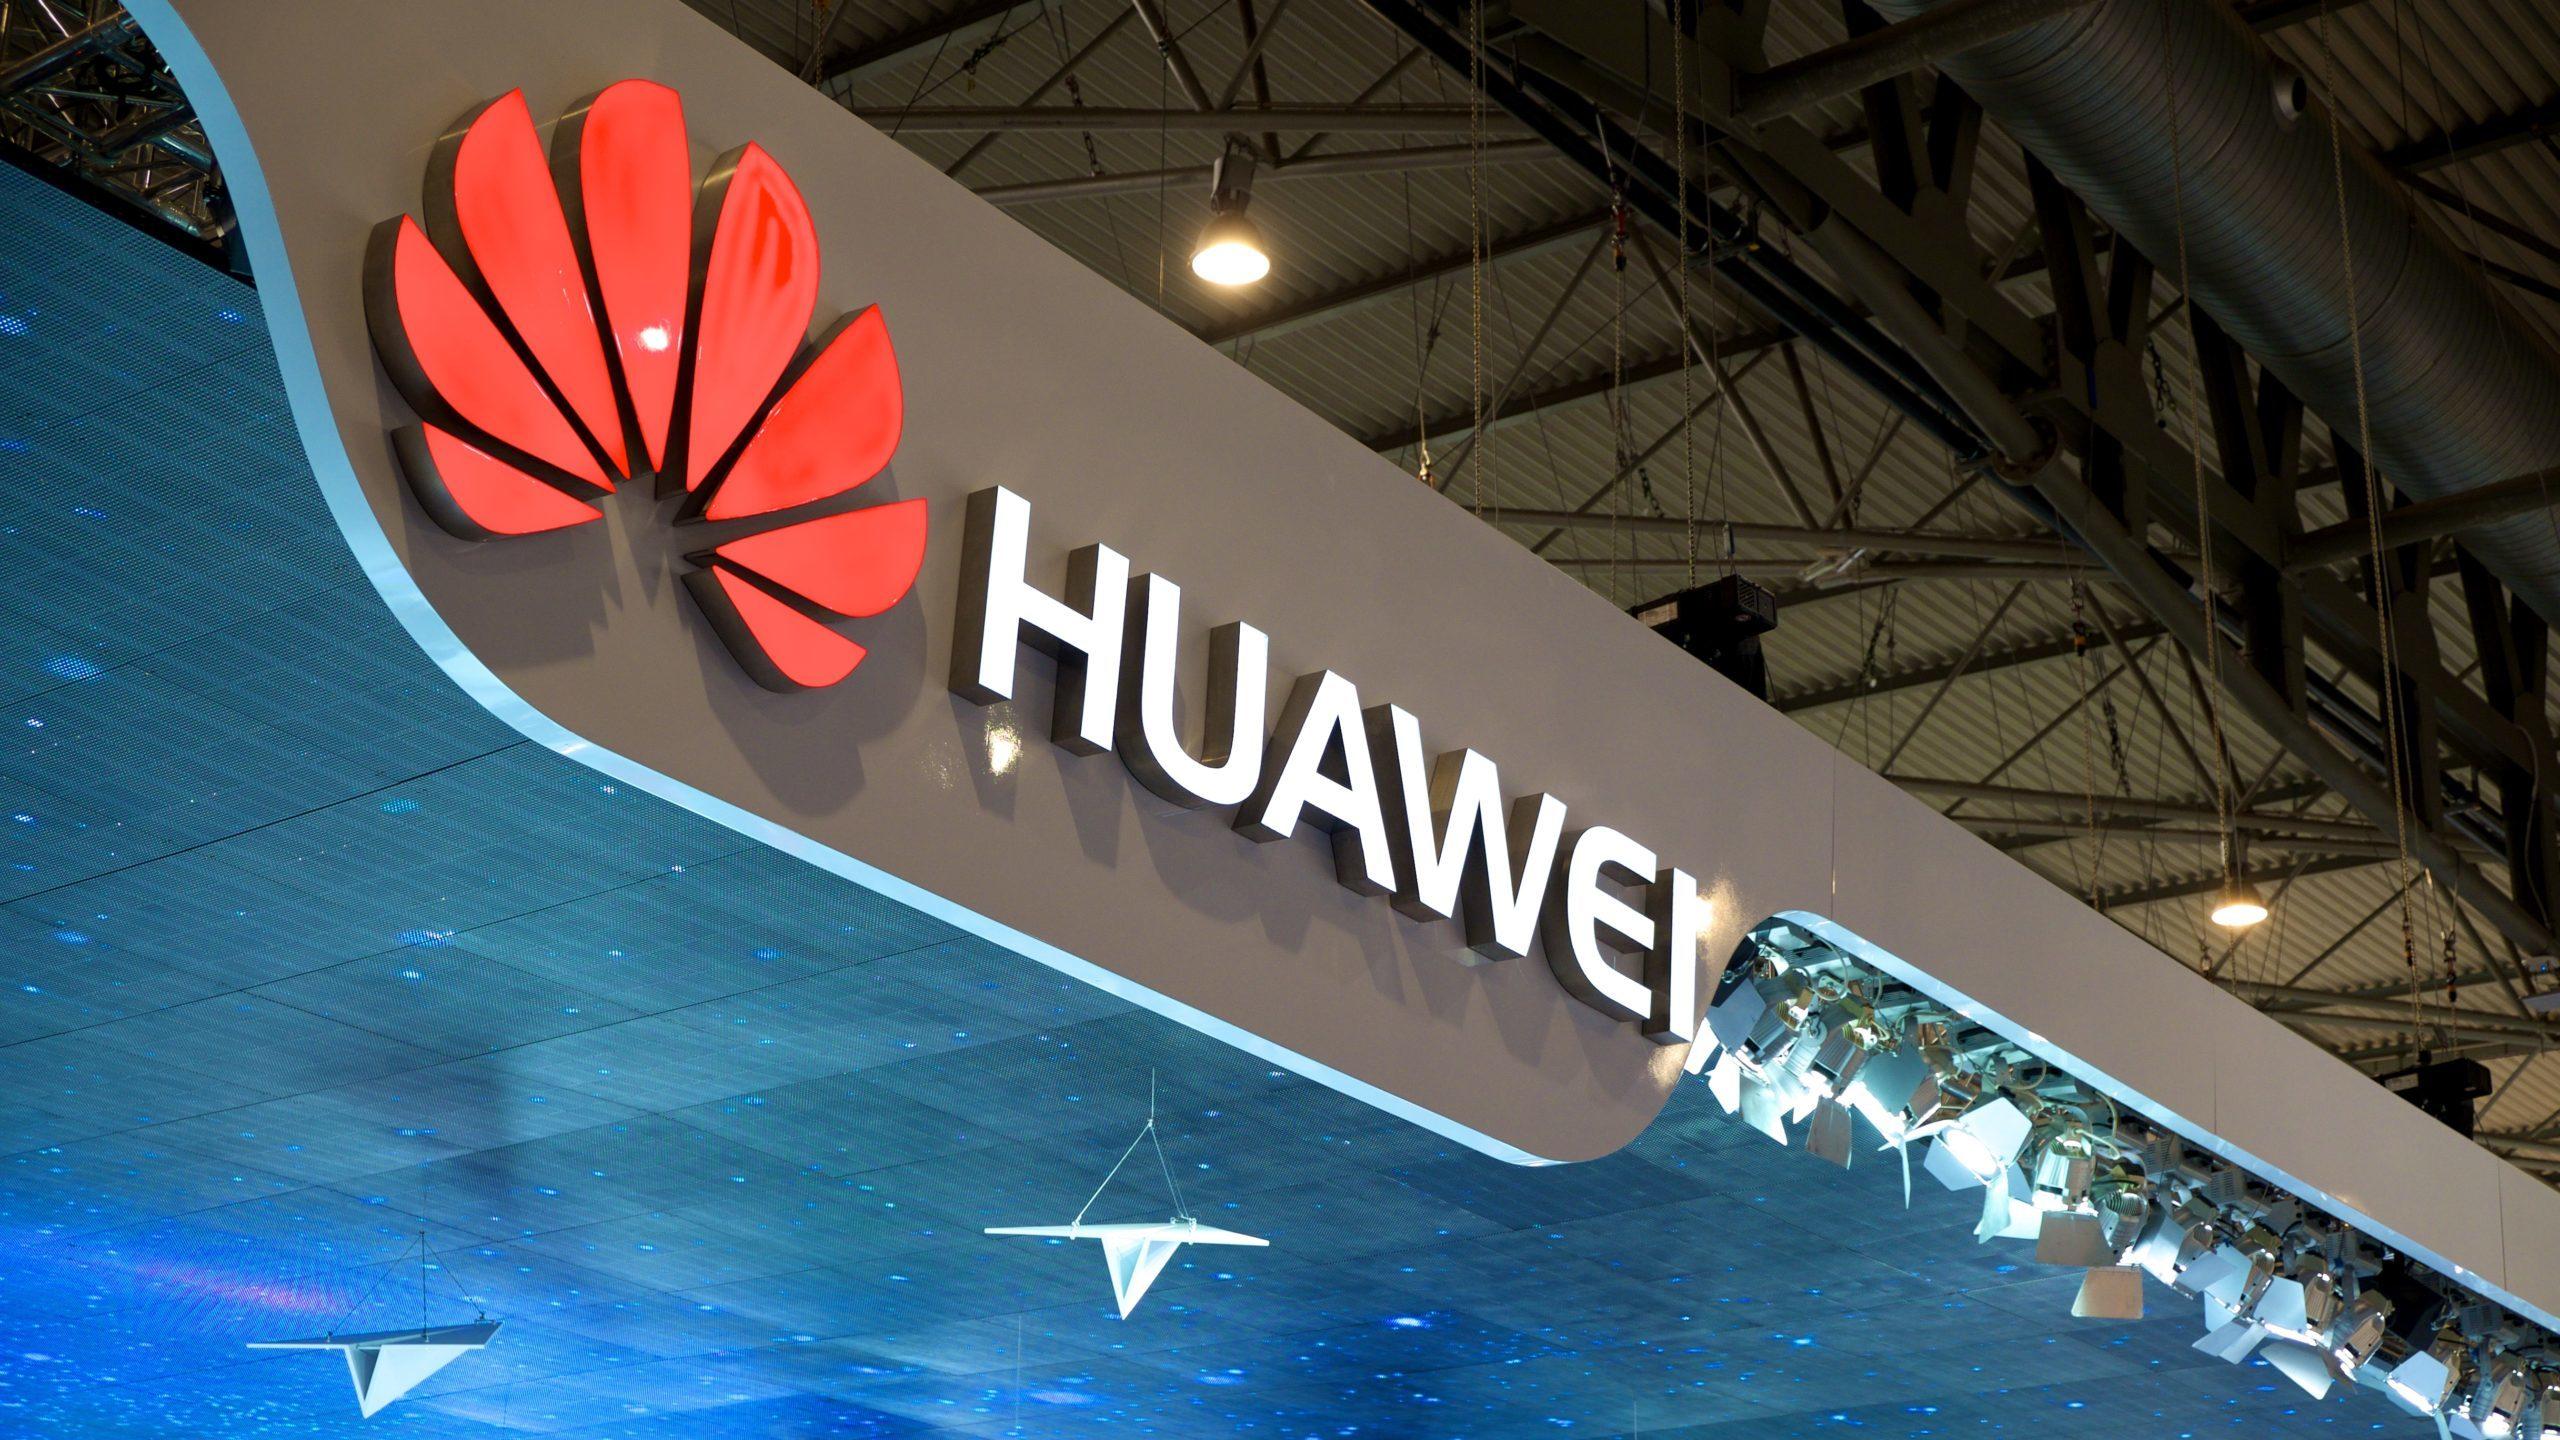 Huawei. Imagem: Kārlis Dambrāns (Flickr)